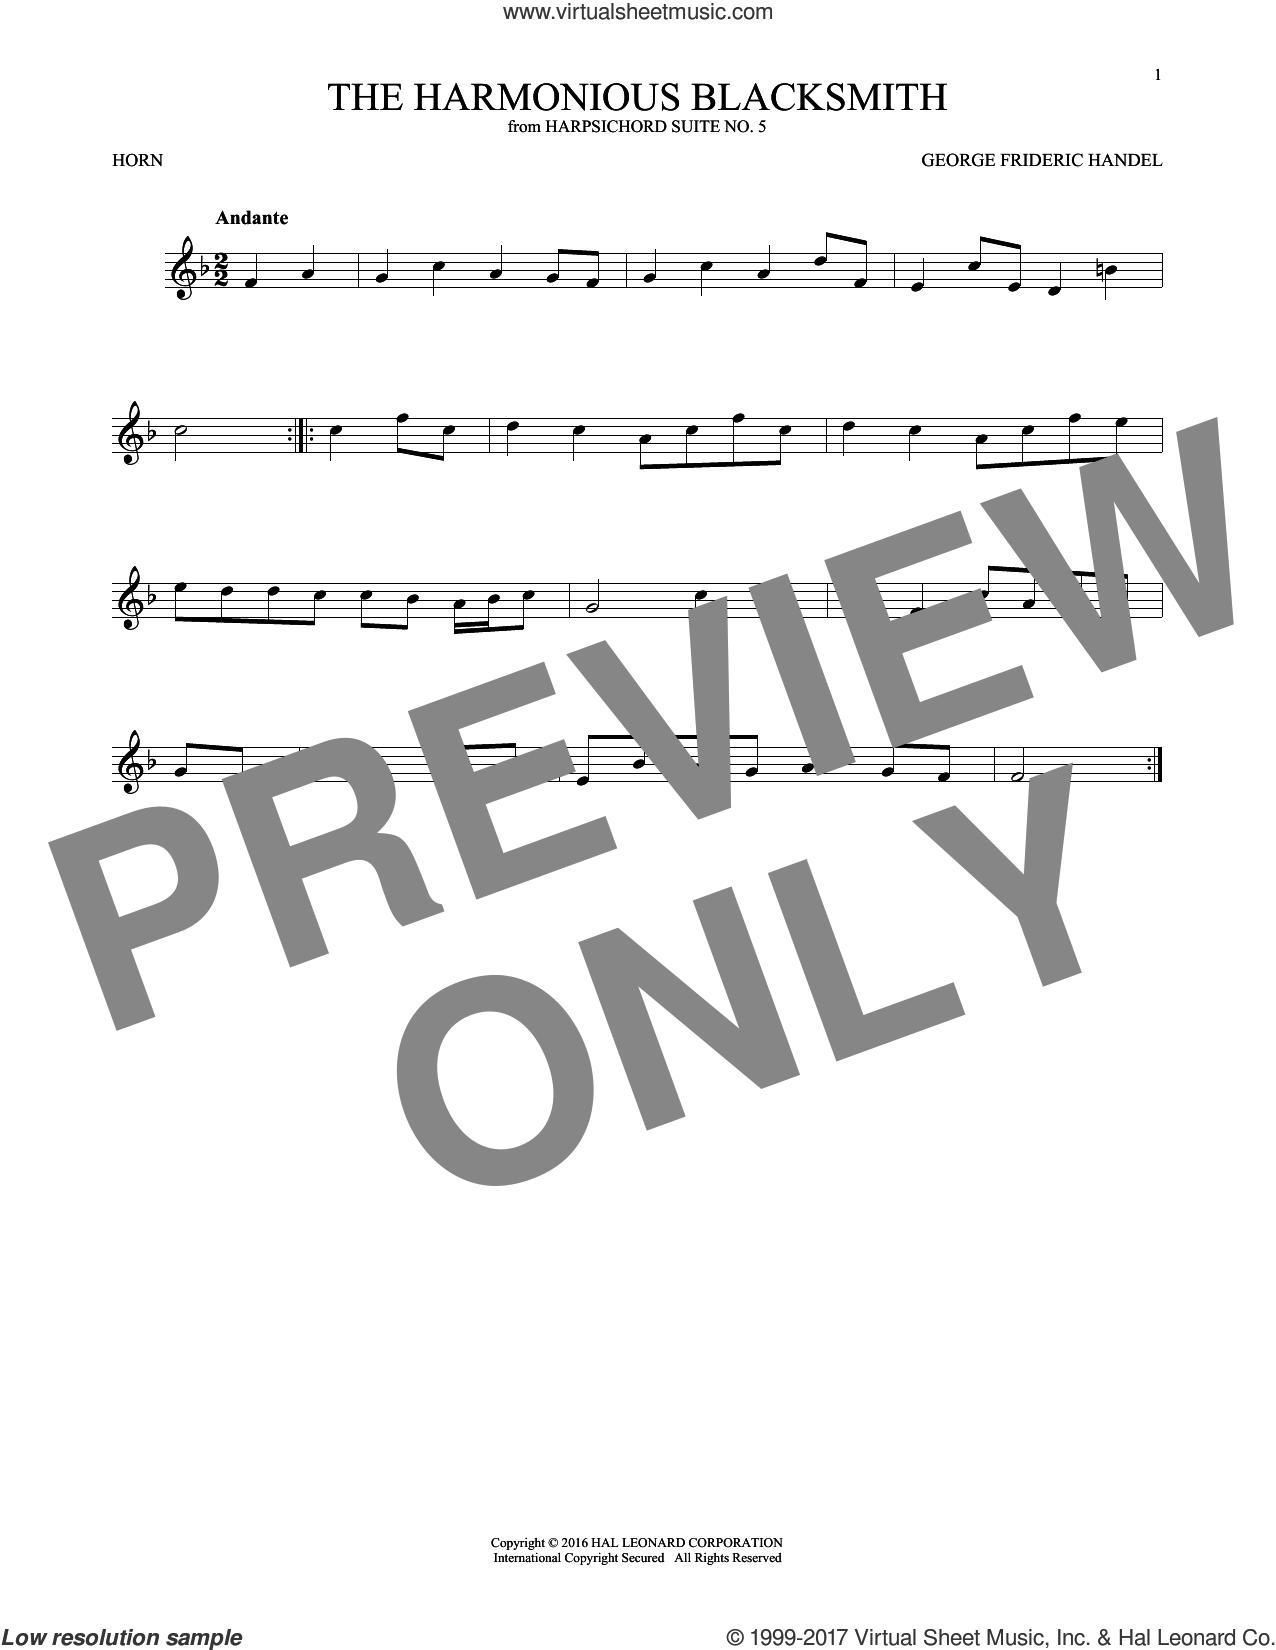 Harmonious Blacksmith sheet music for horn solo by George Frideric Handel, classical score, intermediate skill level